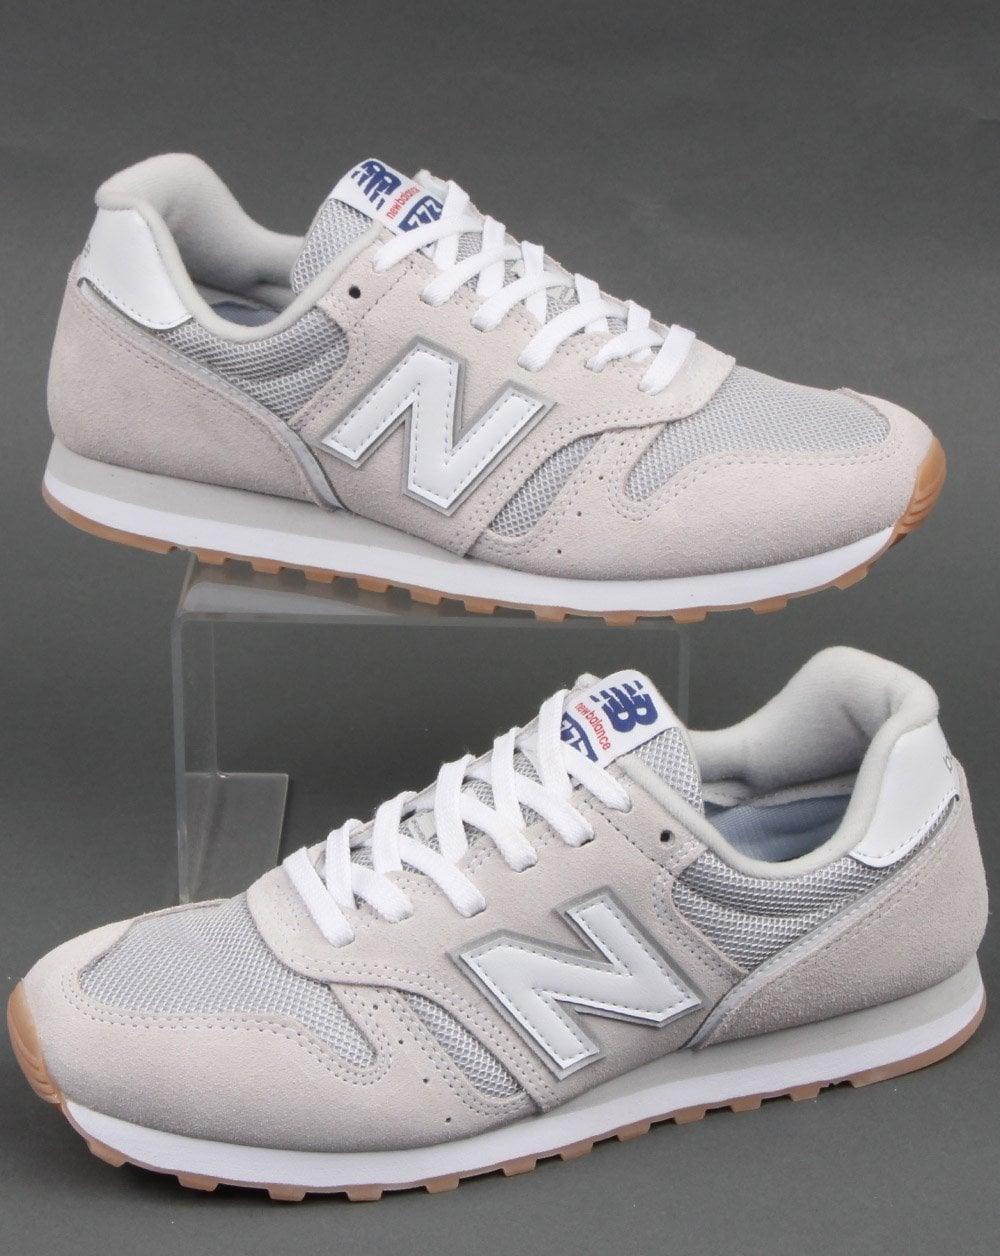 New Balance 373 Trainers Grey